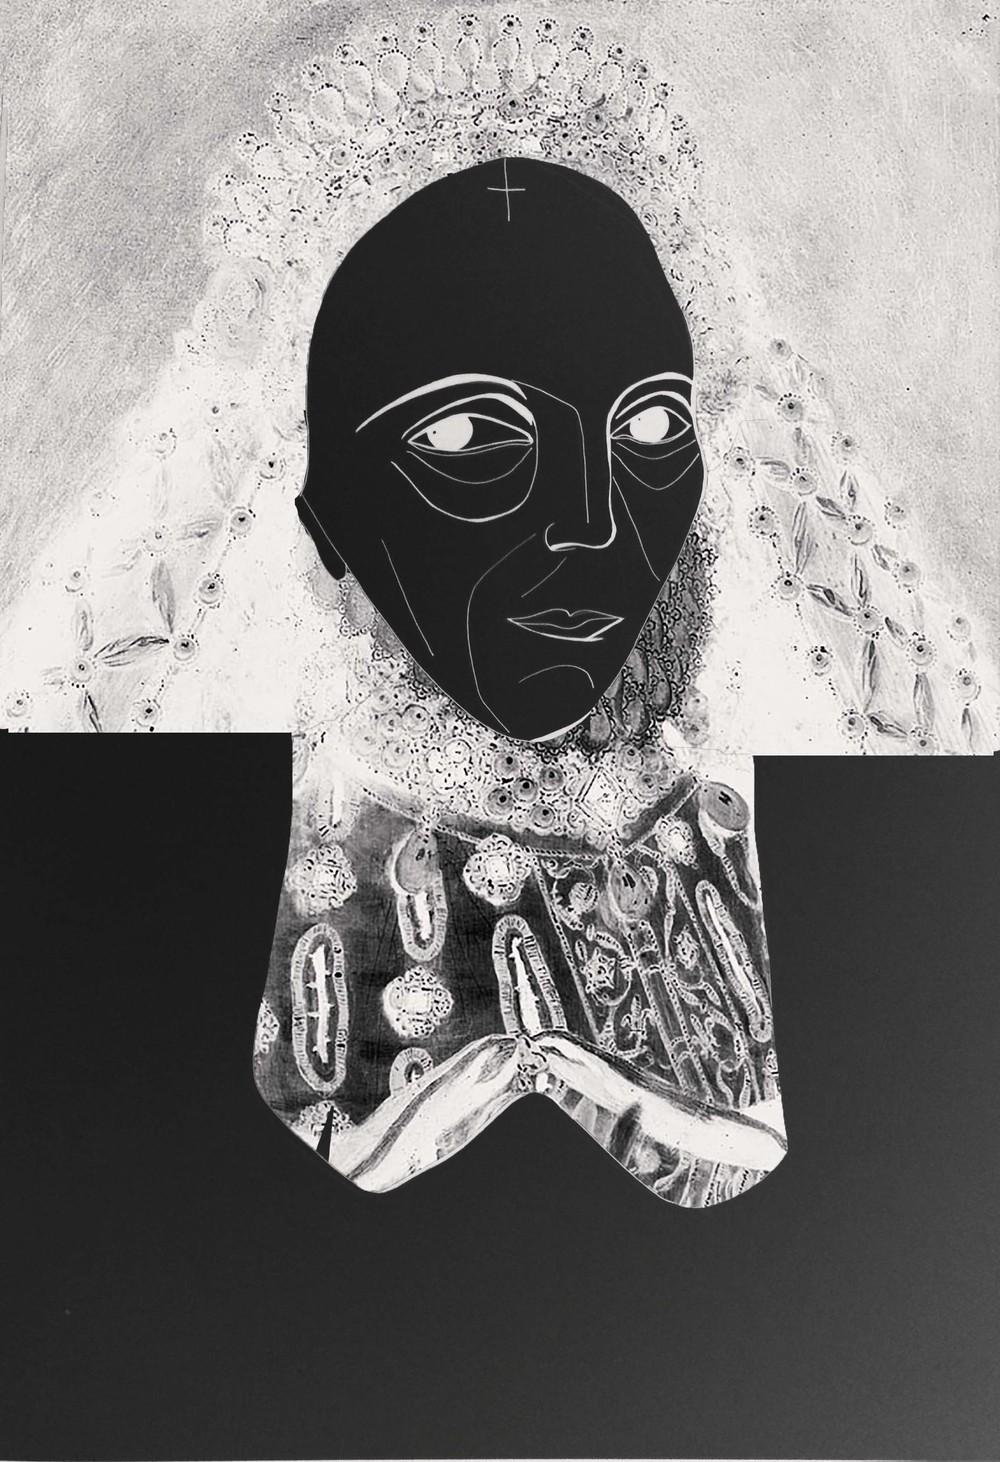 "QUEEN ELIZABETH 30"" x 40"" Print on Canvas $500.00 titbytit@gmail.com"